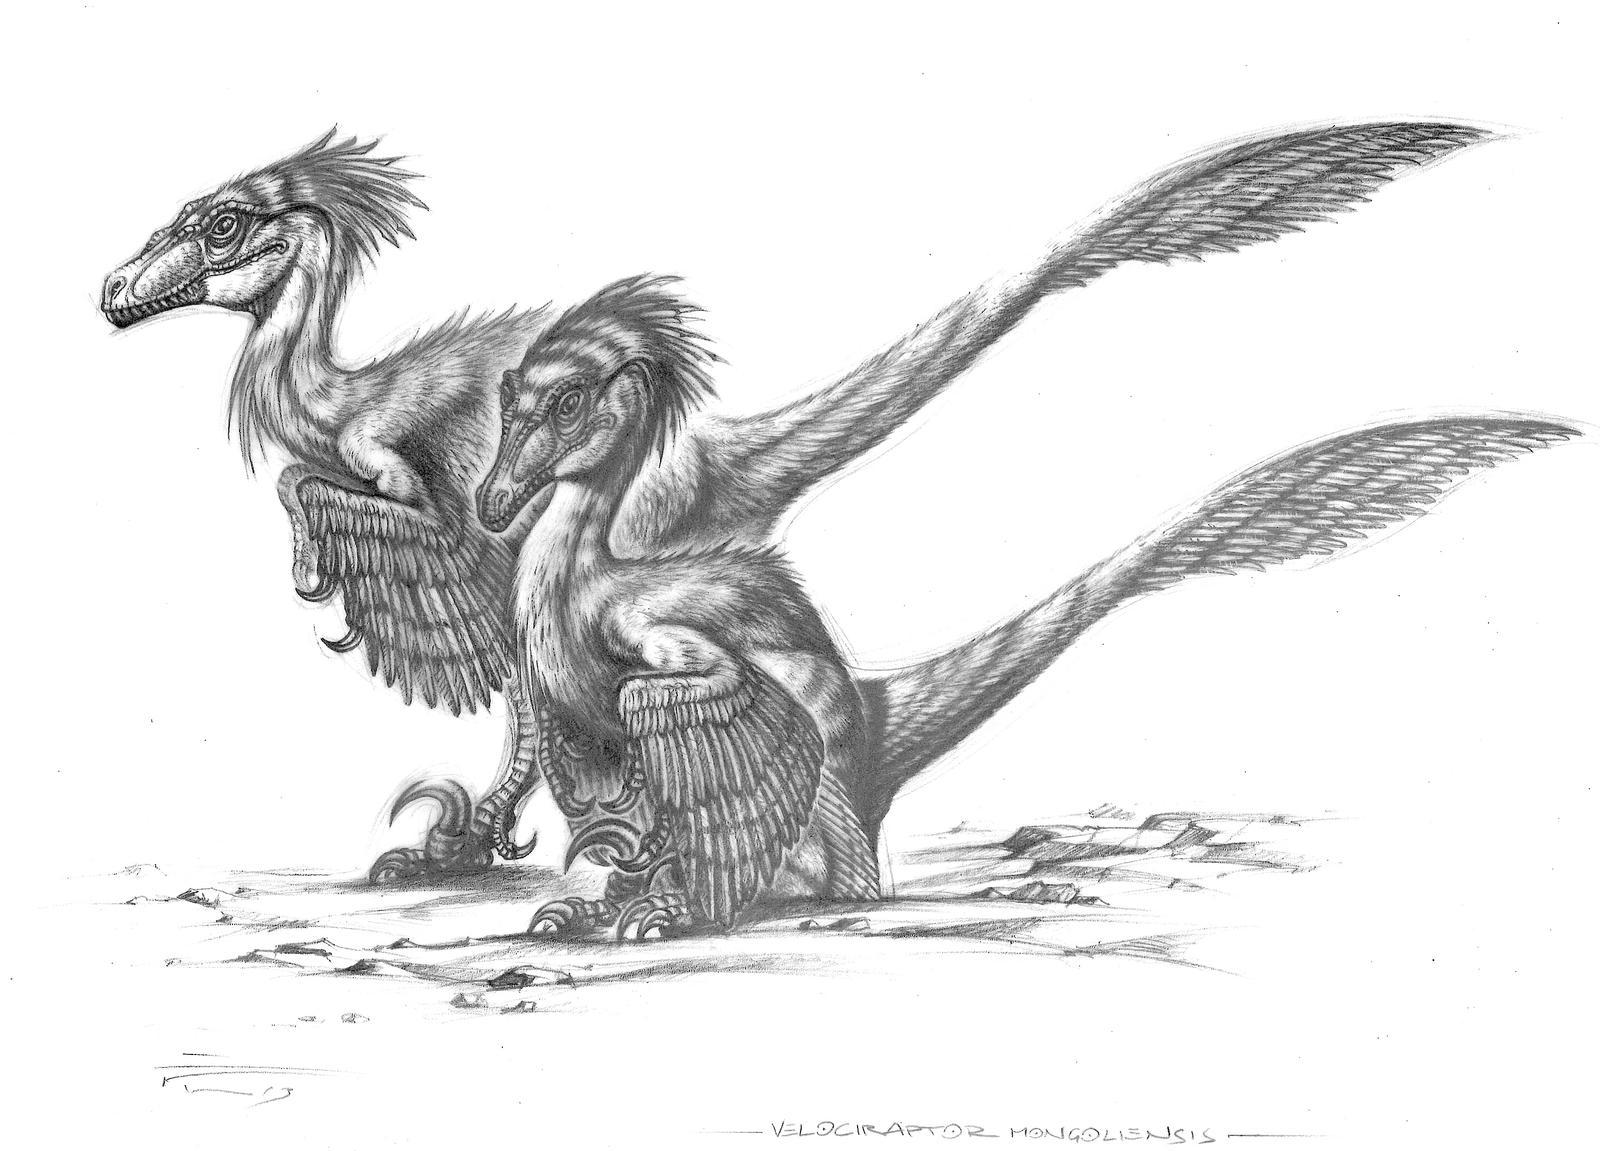 Velociraptor Mongoliensis By Paleopastori On Deviantart